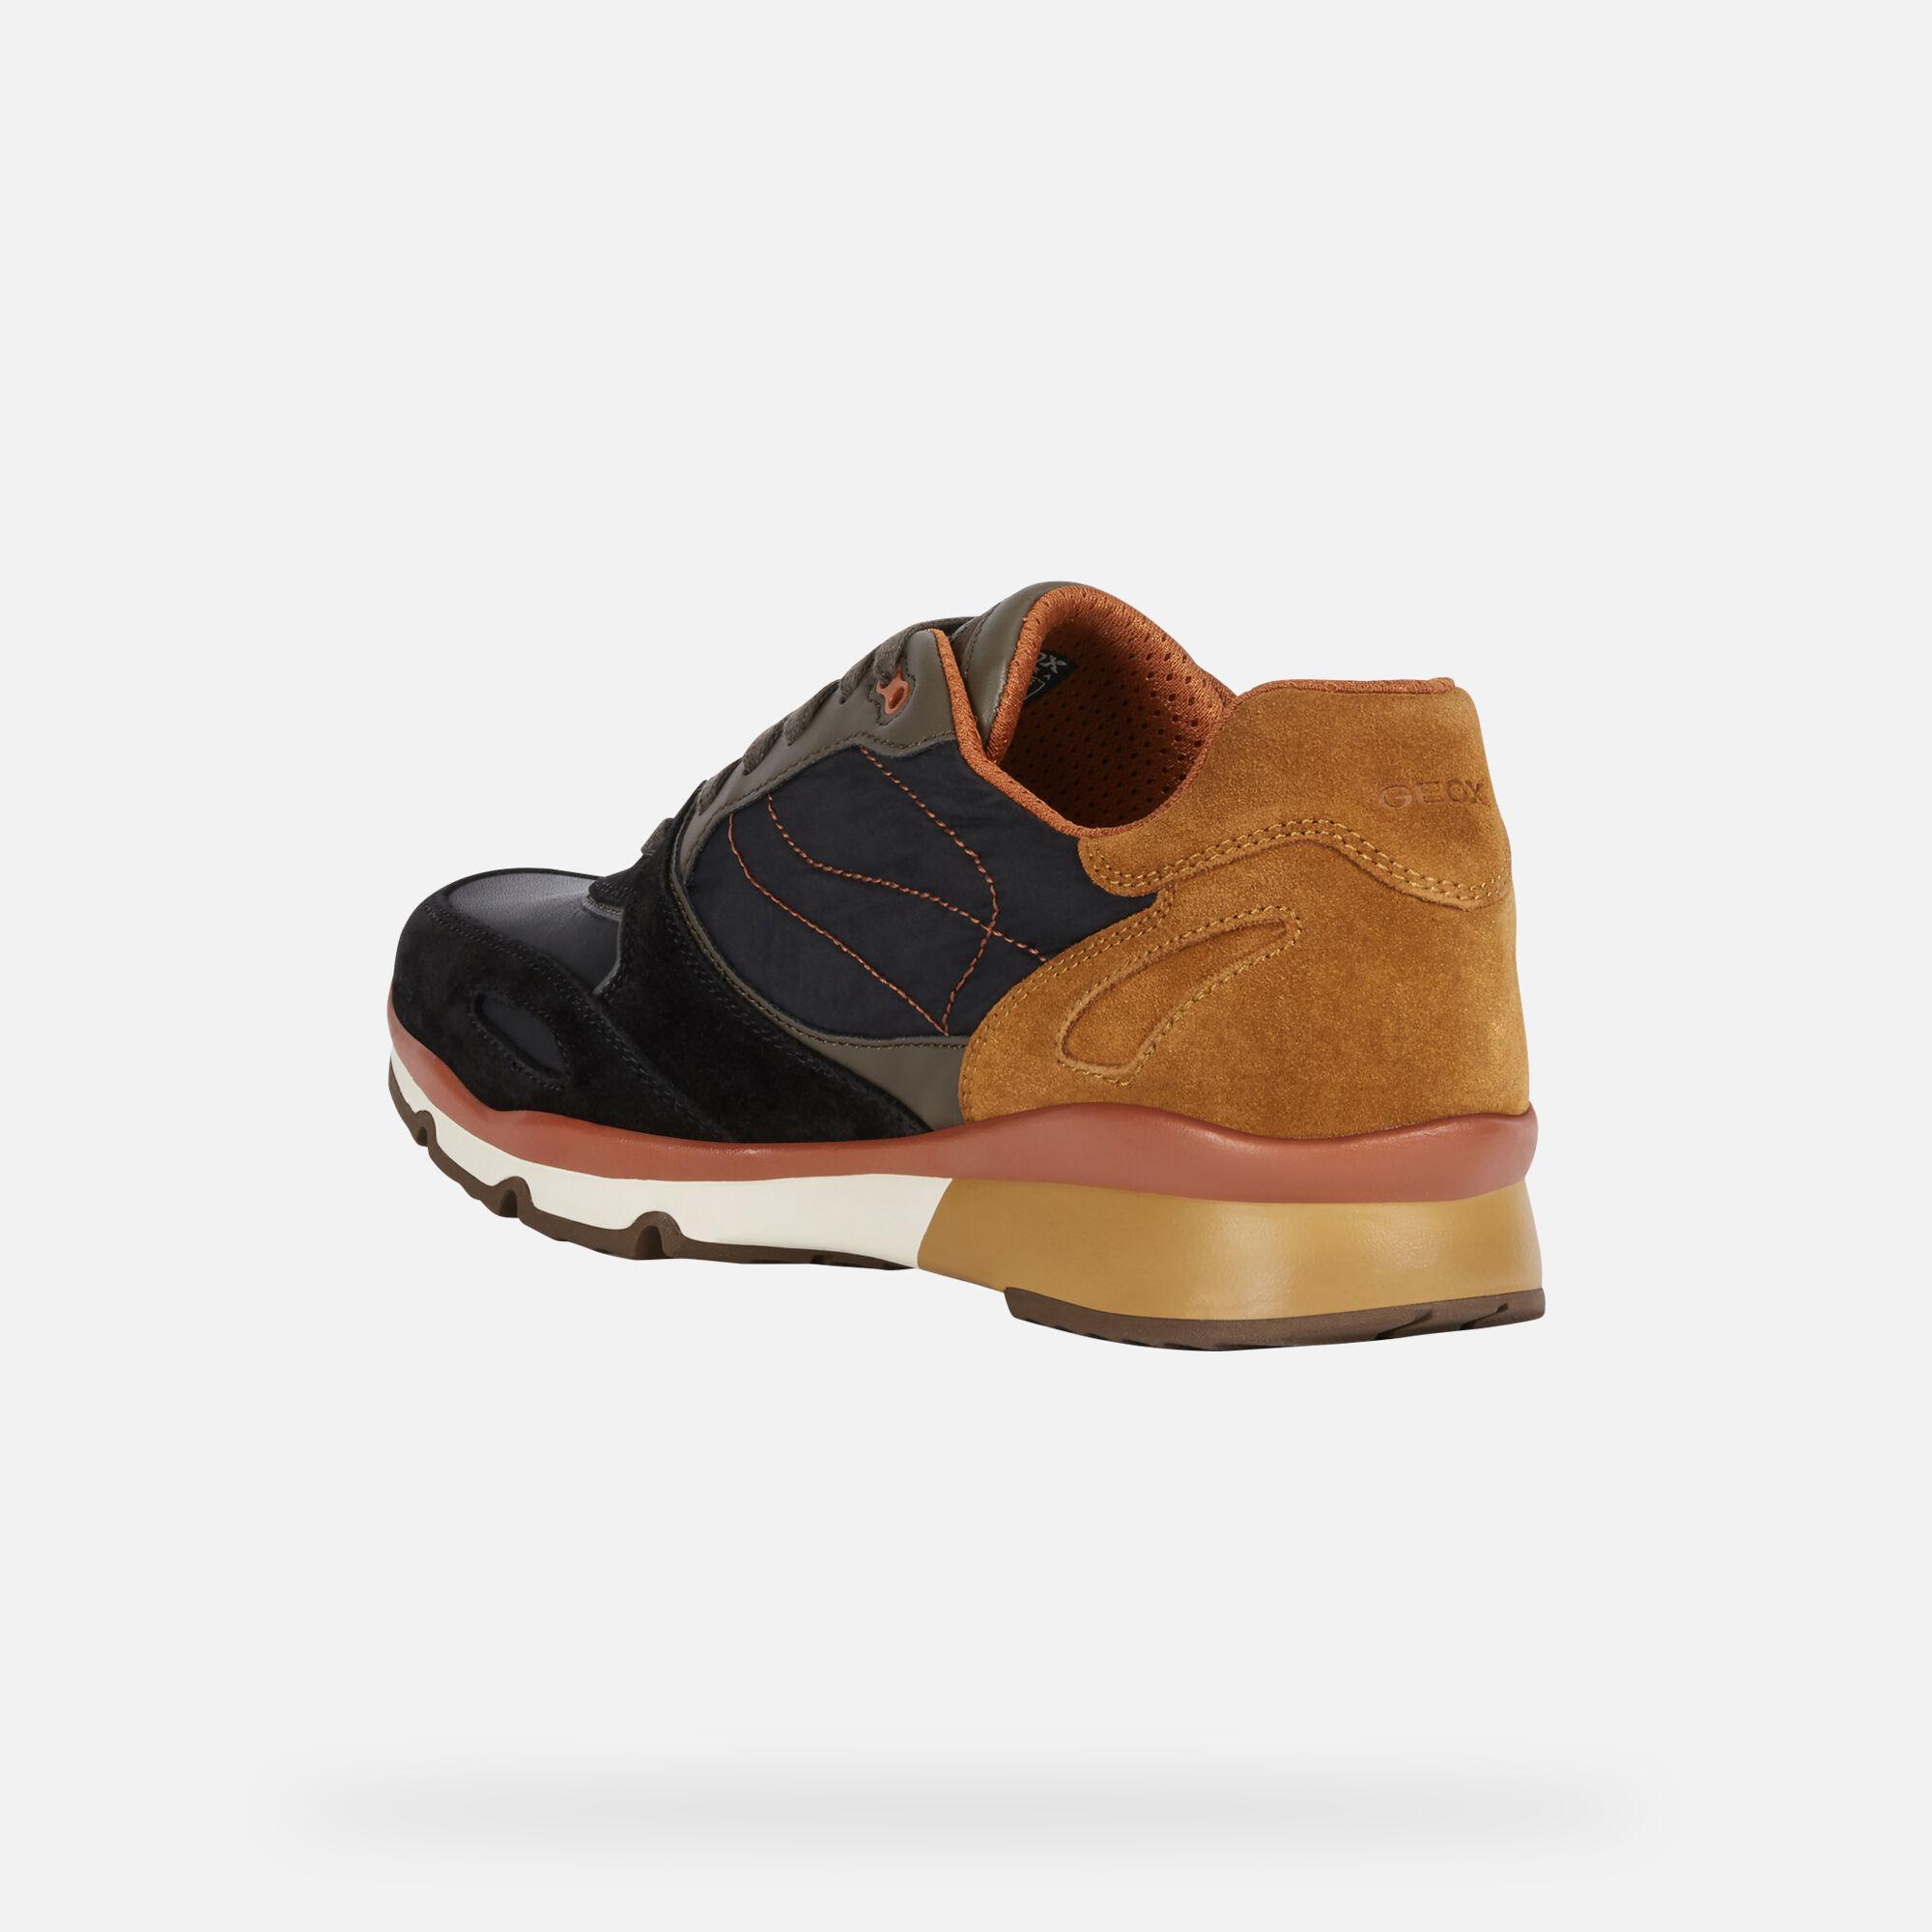 Geox SANDFORD B ABX Uomo: Sneakers Basse Nere | Geox ®